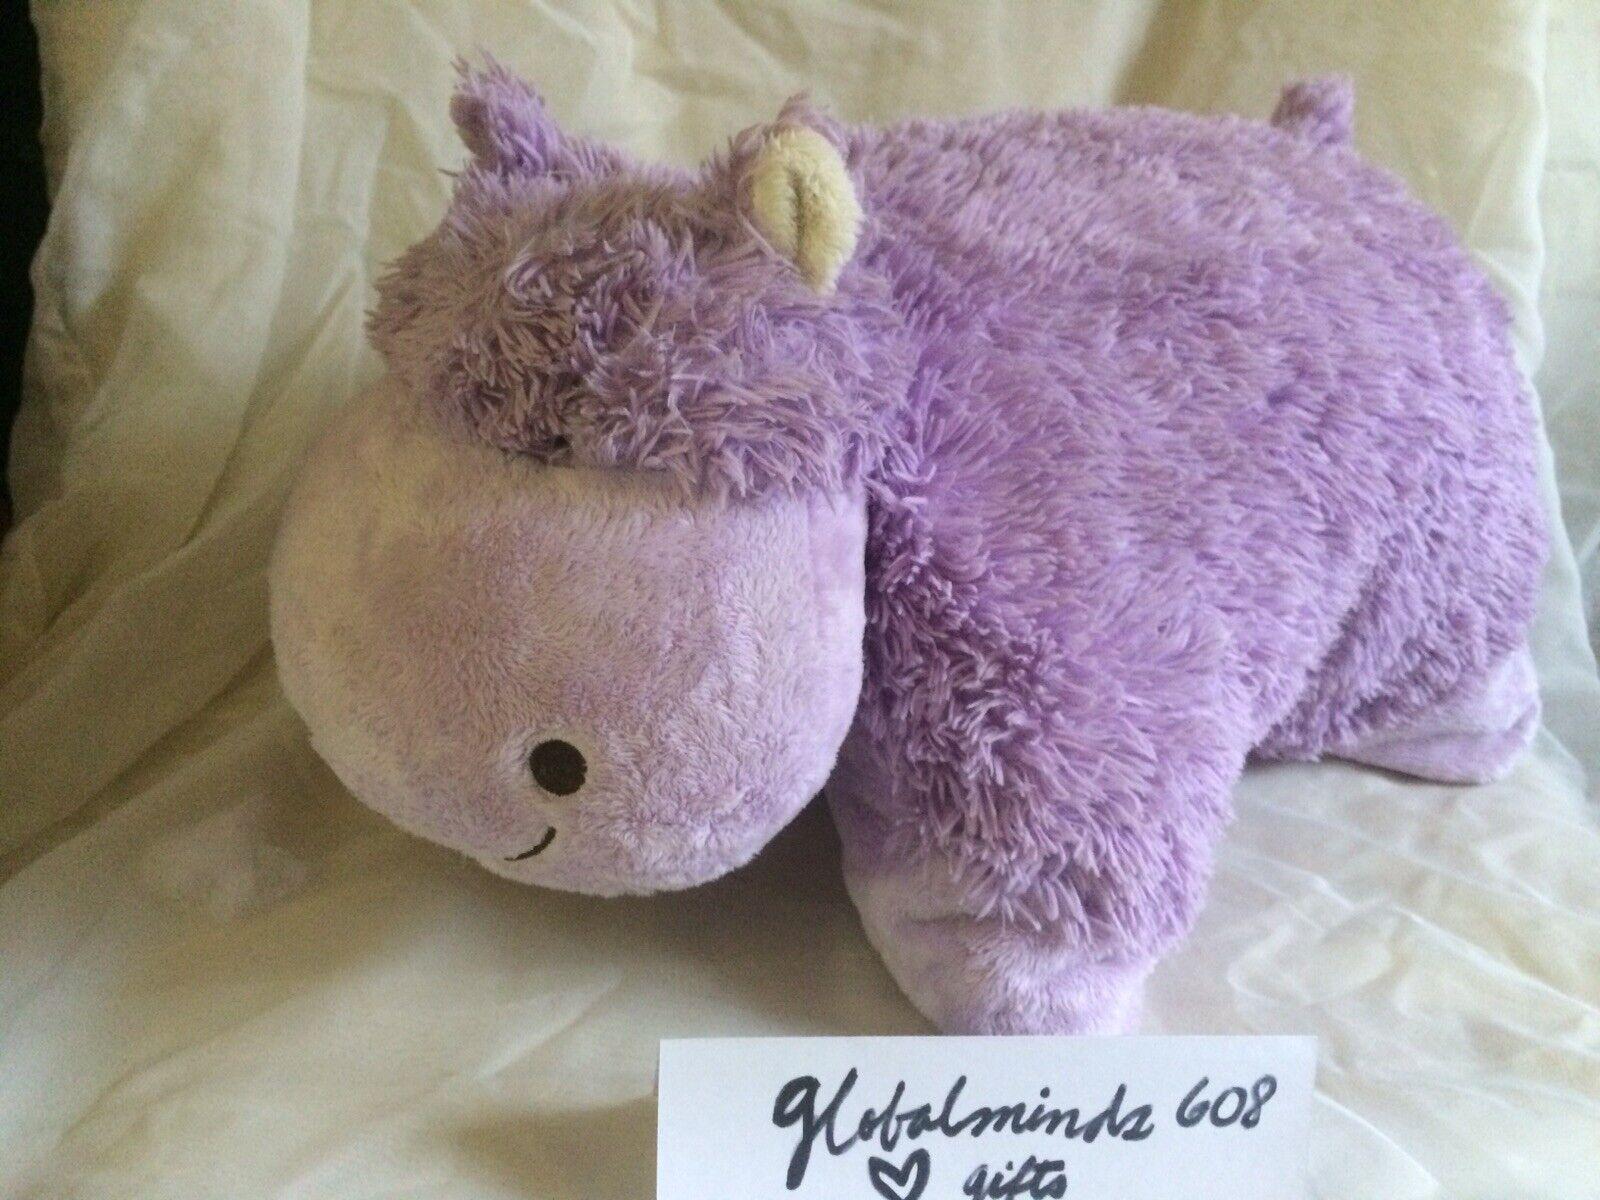 My Pillow Pets Hippo Large viola_Lavender by Pillow Pets TM 18x 17 Soft